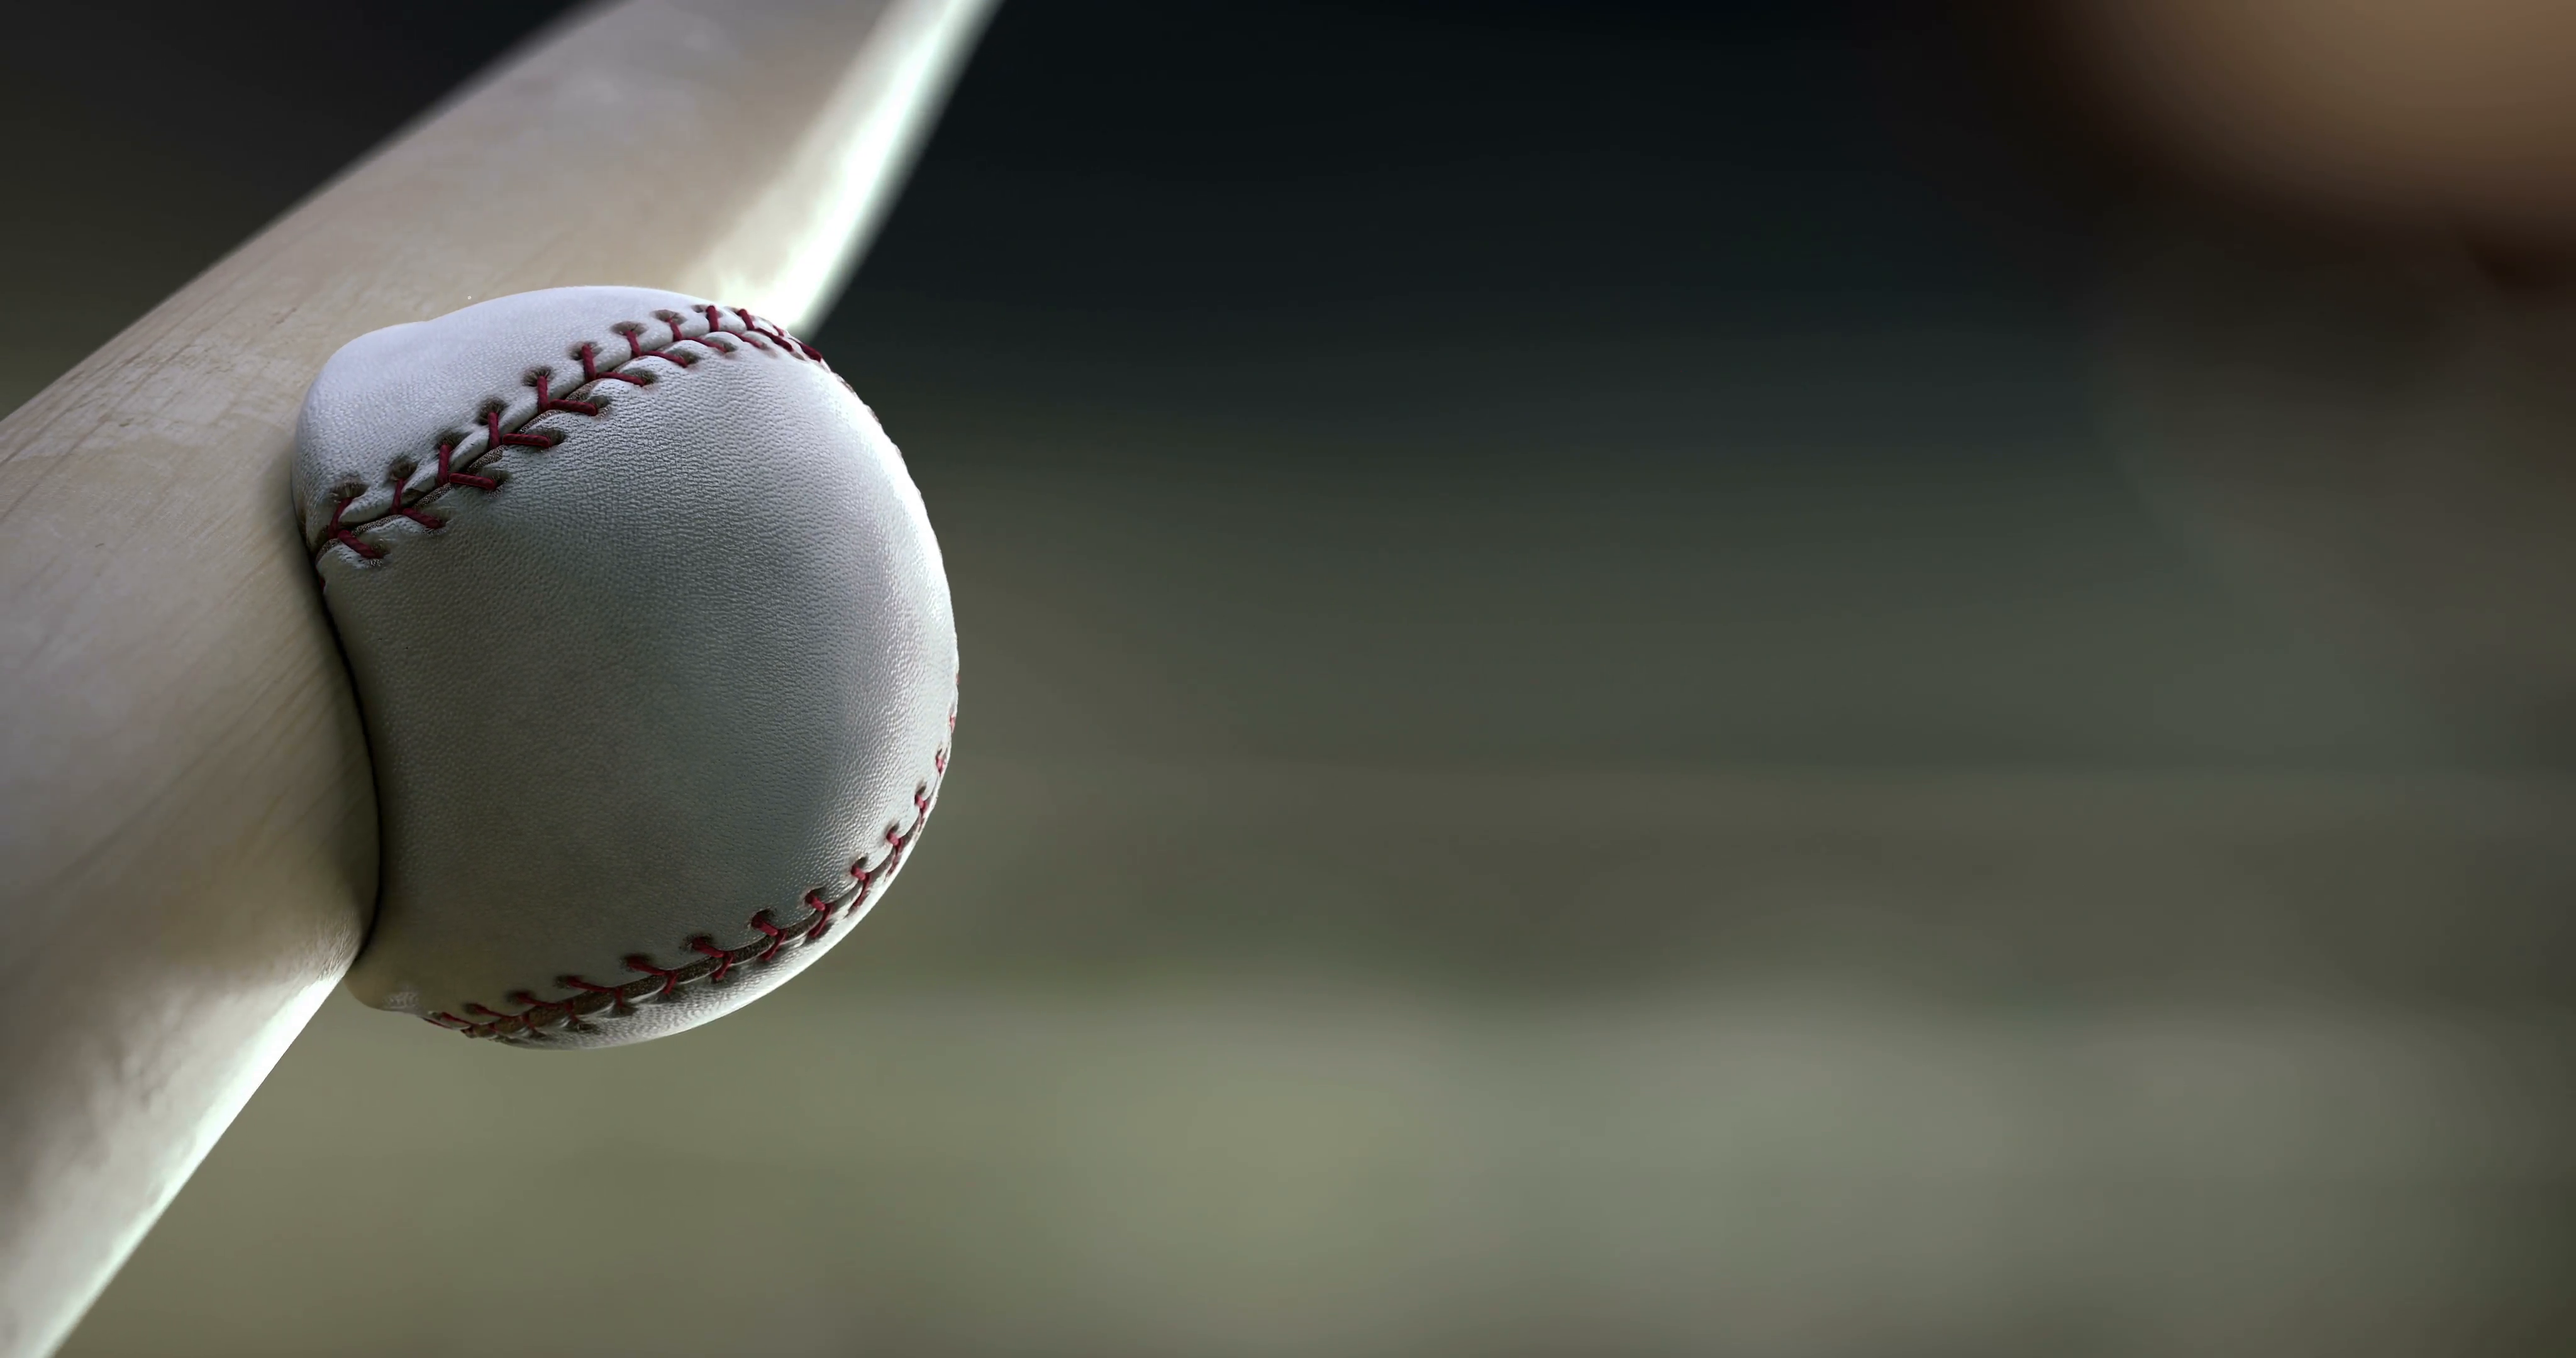 Baseball Bat Hitting Ball PNG - 49991